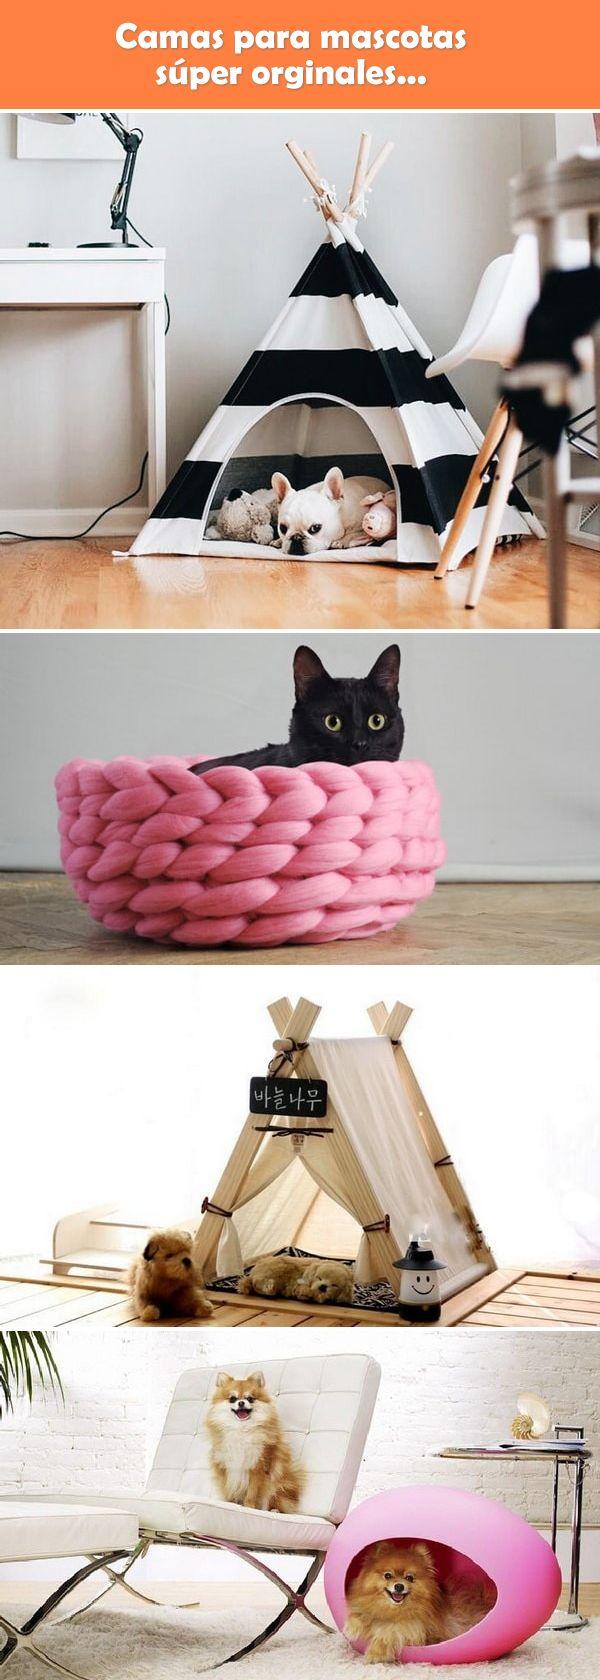 22 best mascotas images on pinterest pet beds cat beds for Cama para perros